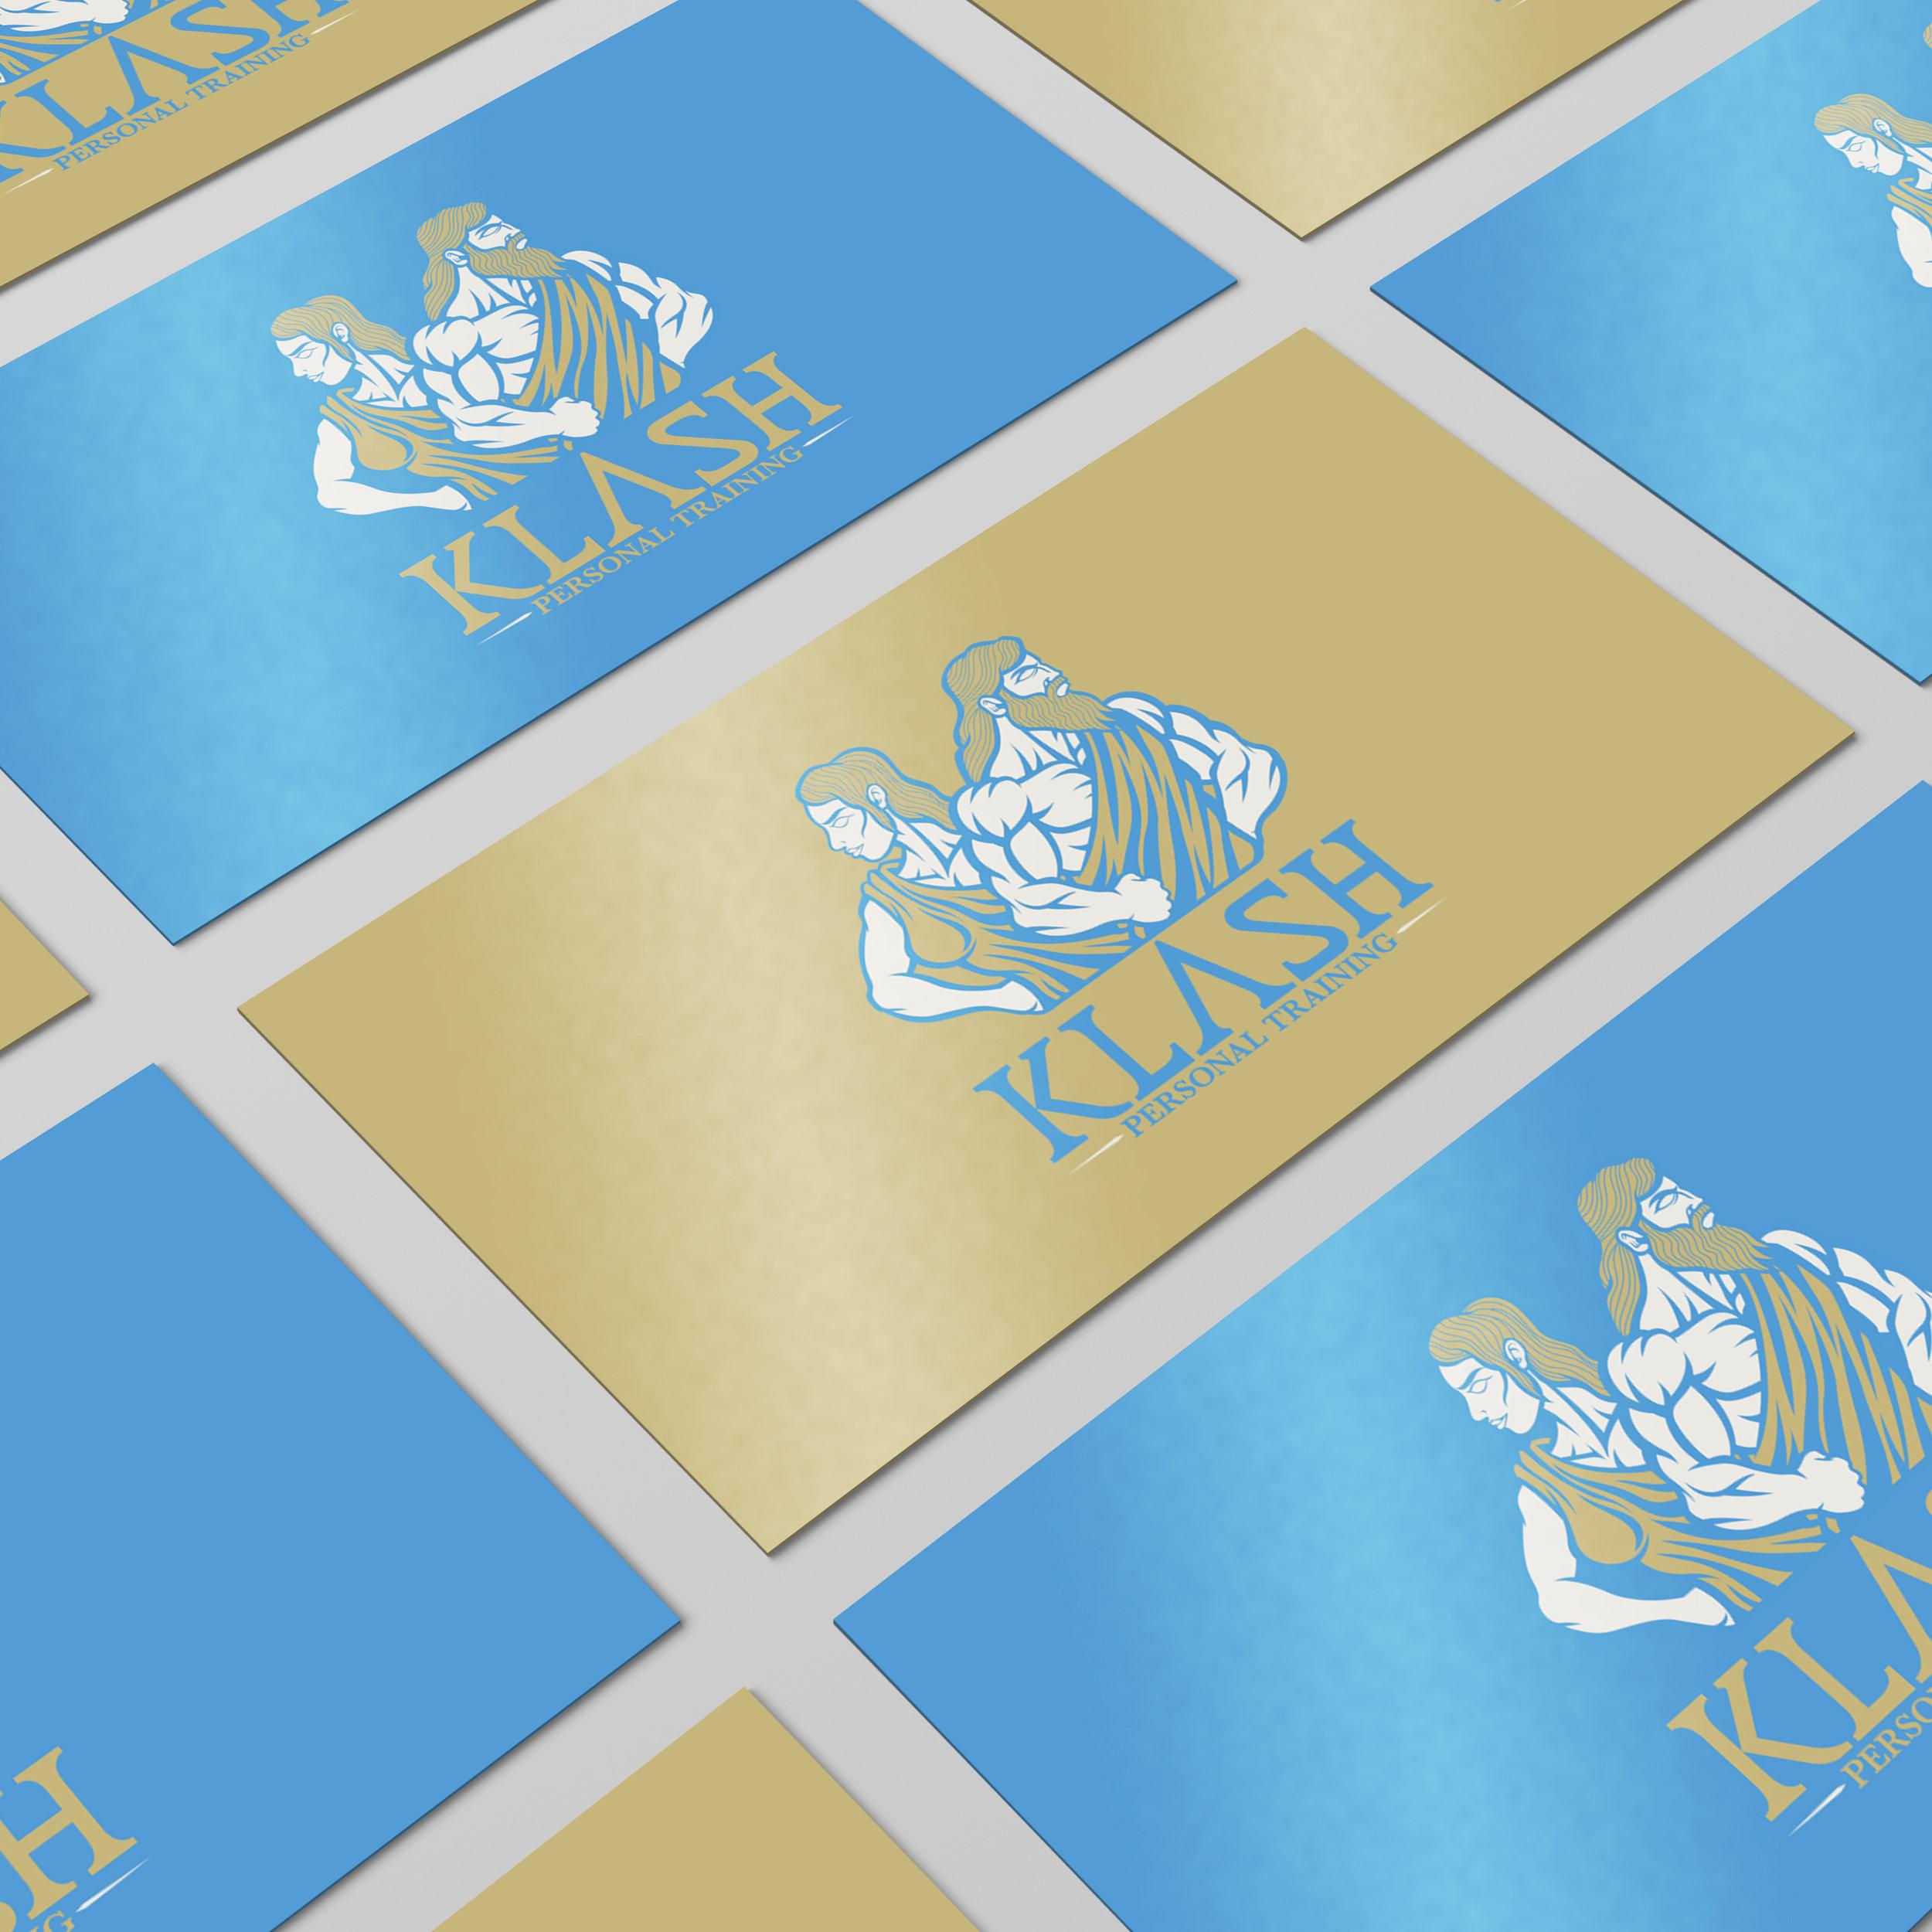 klash-personal-training-logo-logos-branding-greek-roman-graphicdesign-orozco-design-roberto-identity-vegas-lasvegas-vector-businesscard.jpg